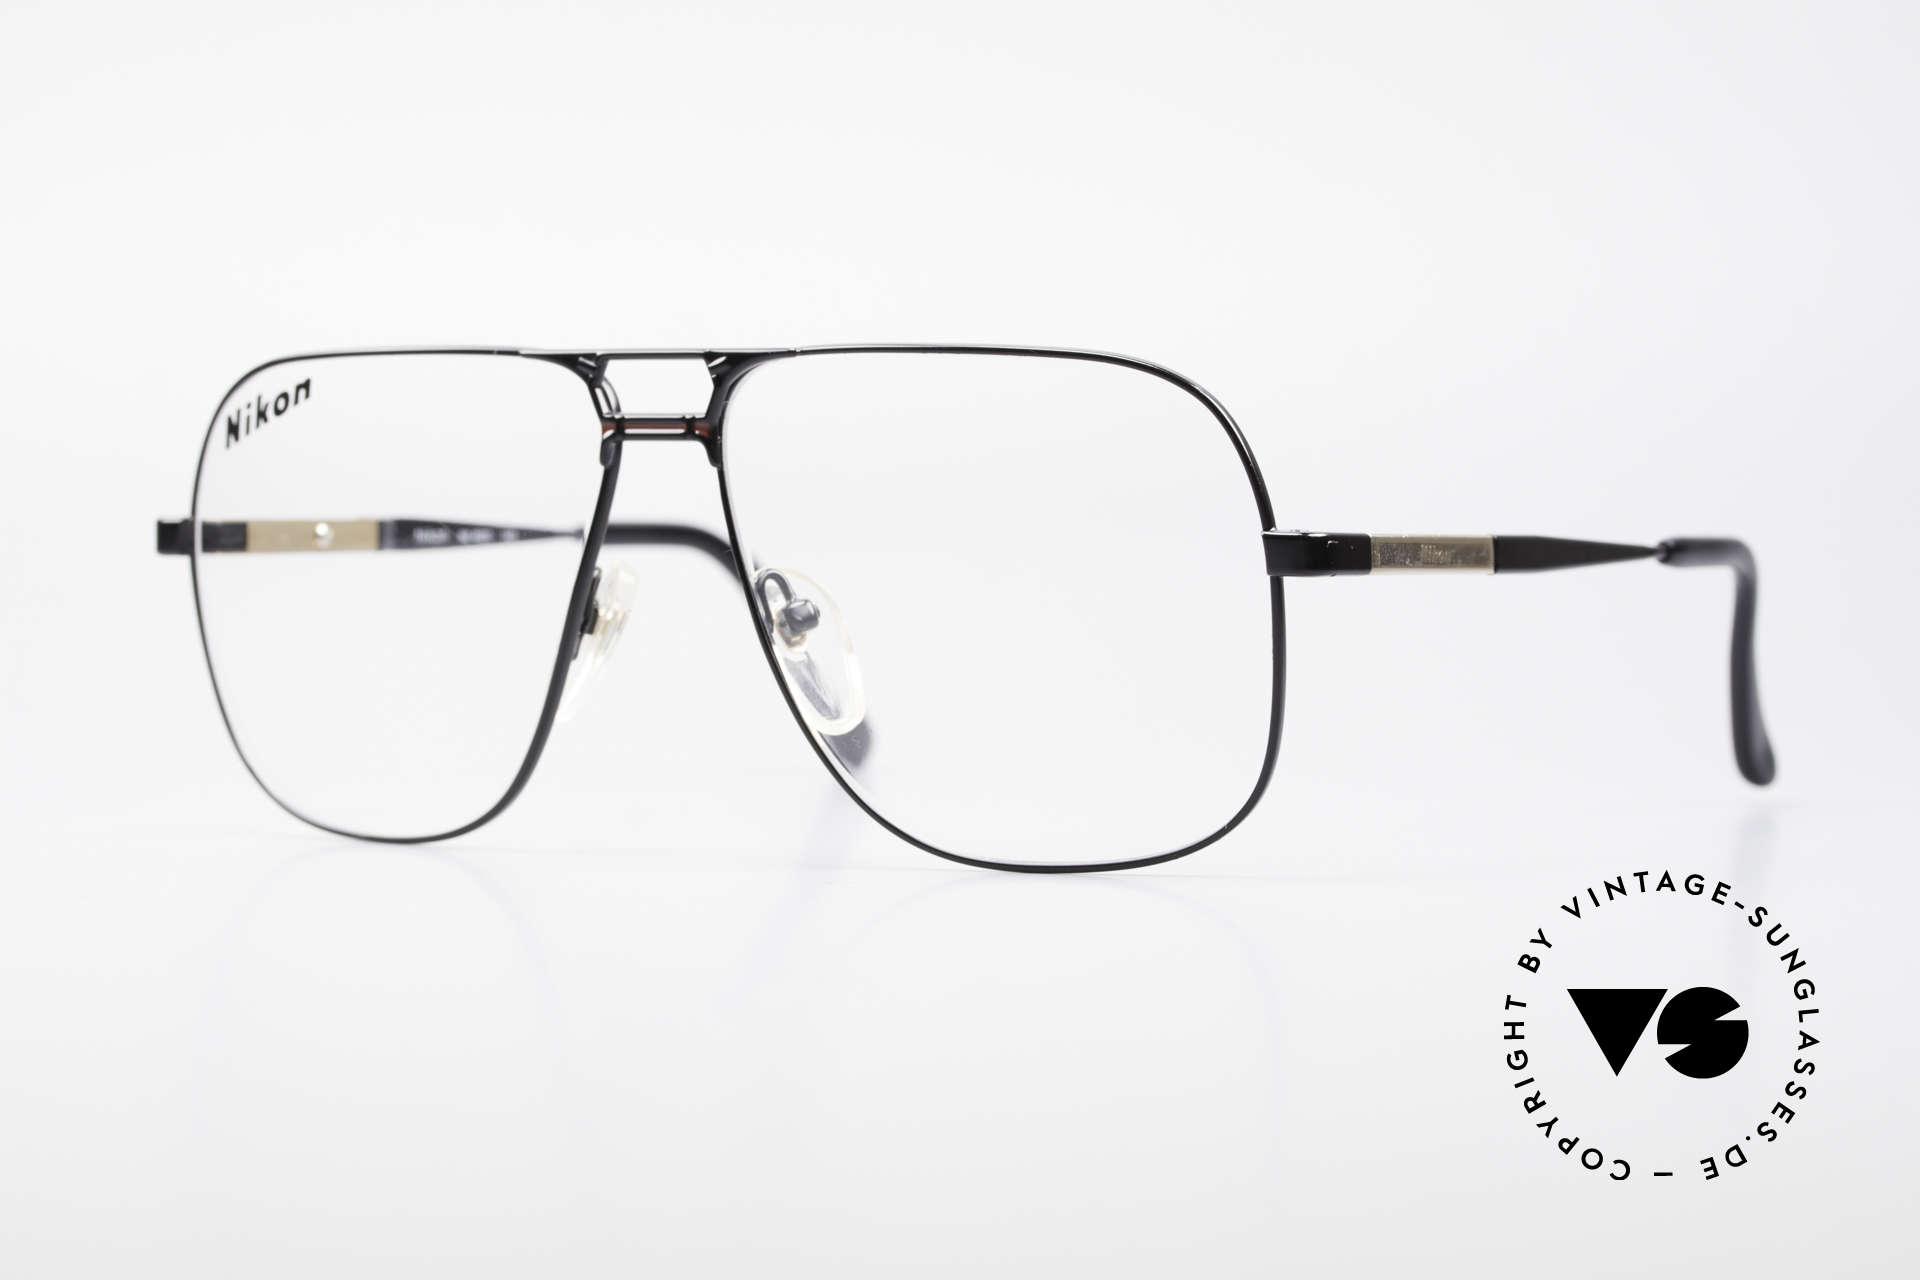 Nikon NK4520 80's XXL Vintage Men's Frame, classic 1980's vintage eyeglasses by NIKON (JAPAN), Made for Men